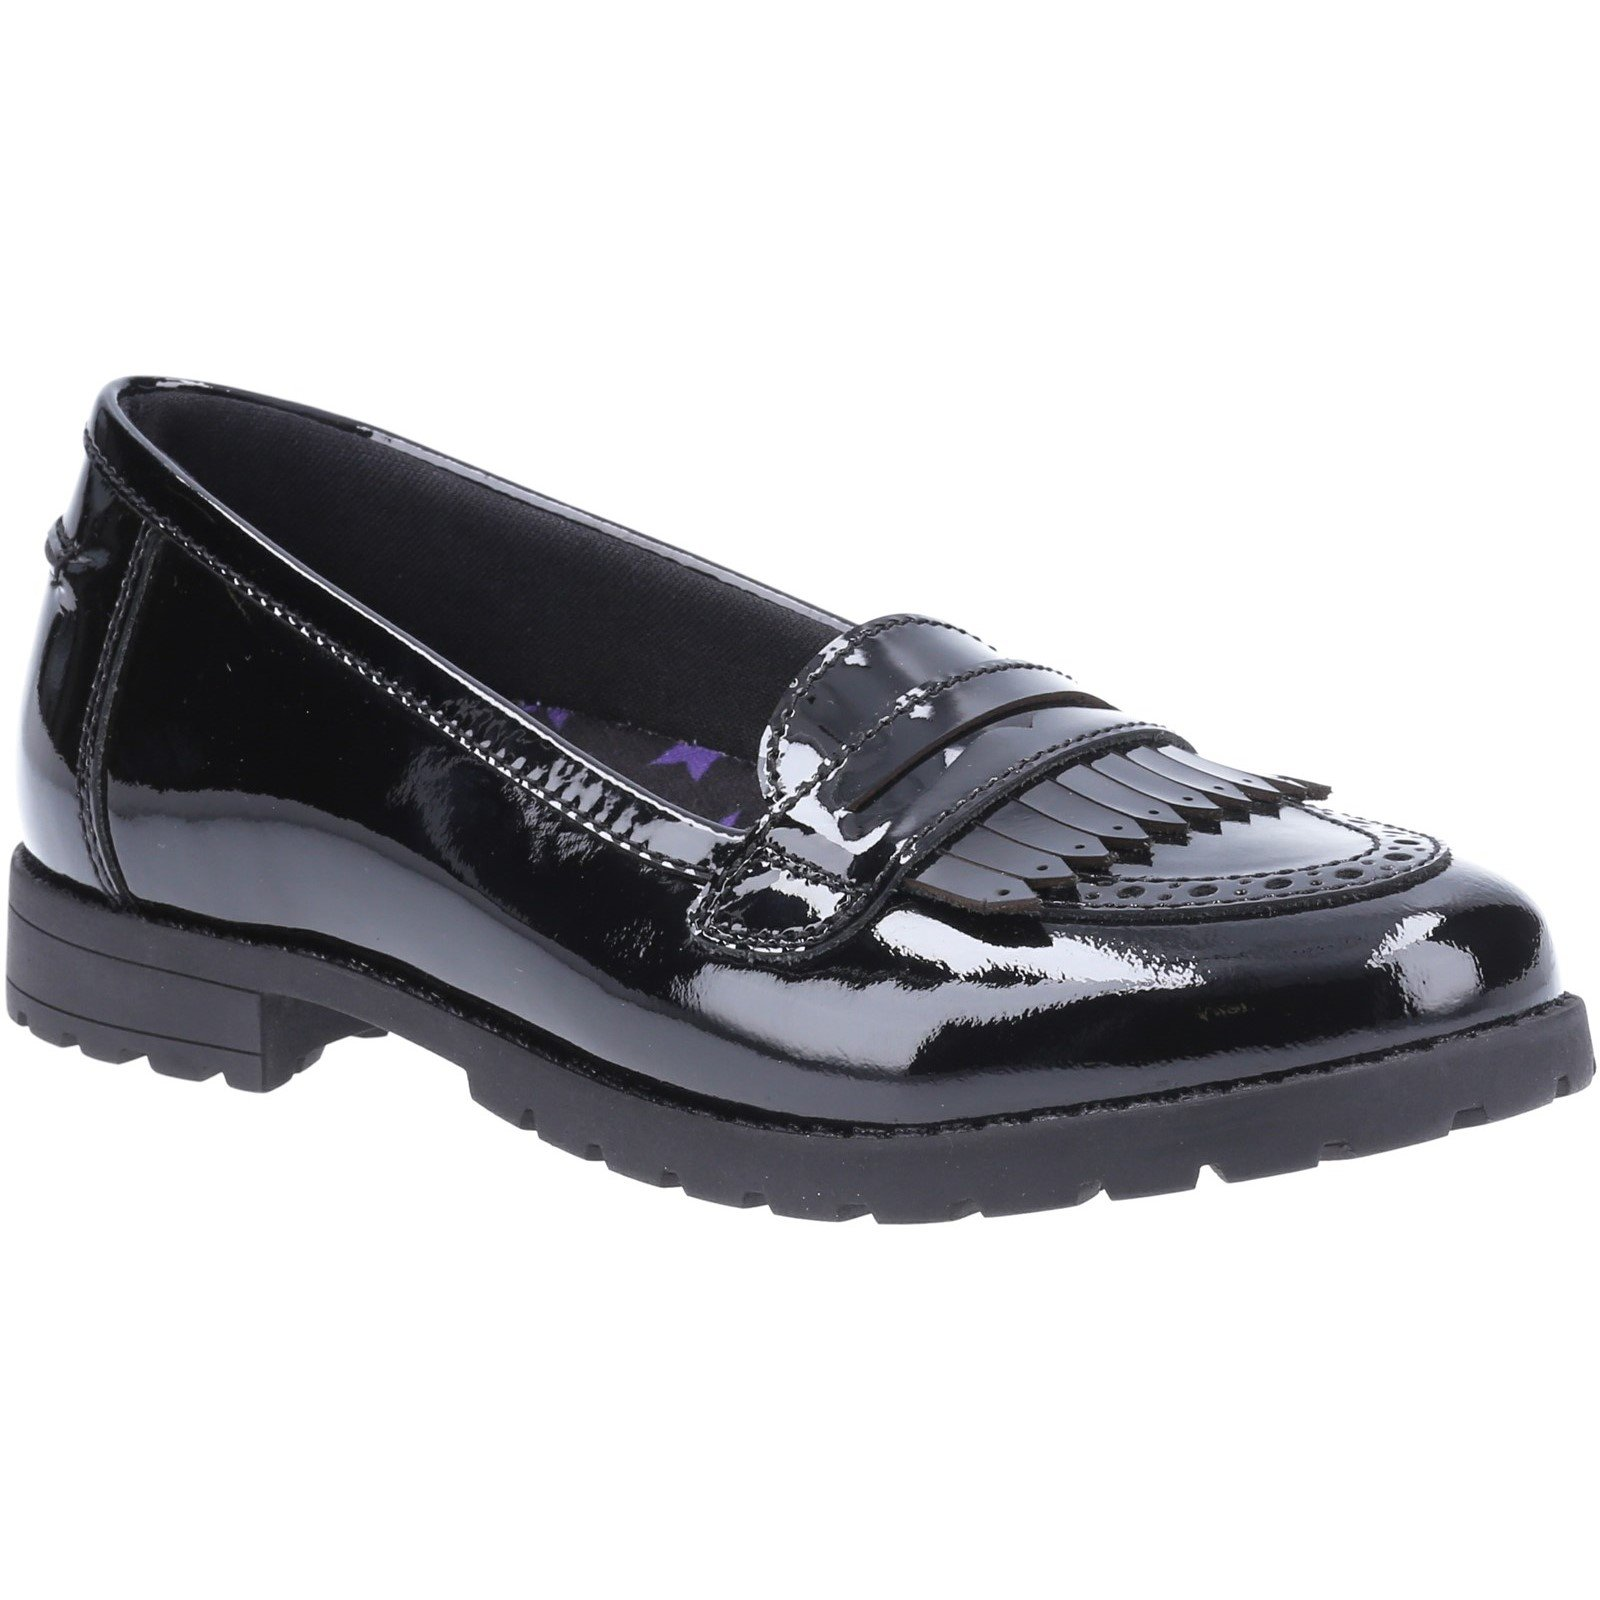 Hush Puppies Kid's Emer Senior School Shoe Patent Black 32596 - Patent Black 4